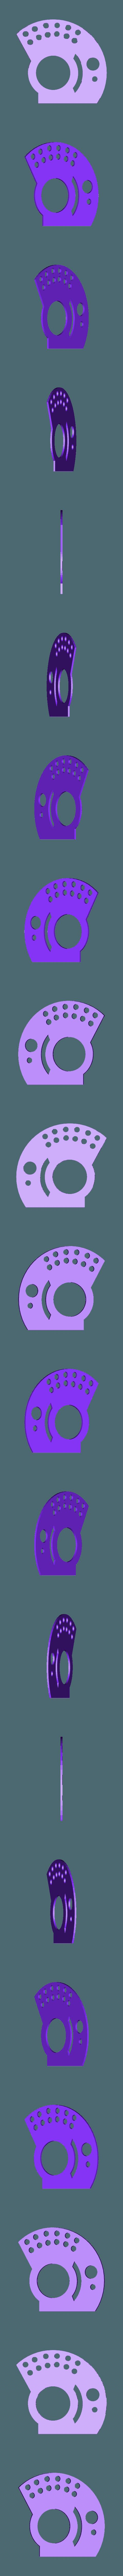 Topo.stl Download free STL file Teclado Gamer • Model to 3D print, CircuitoMaker